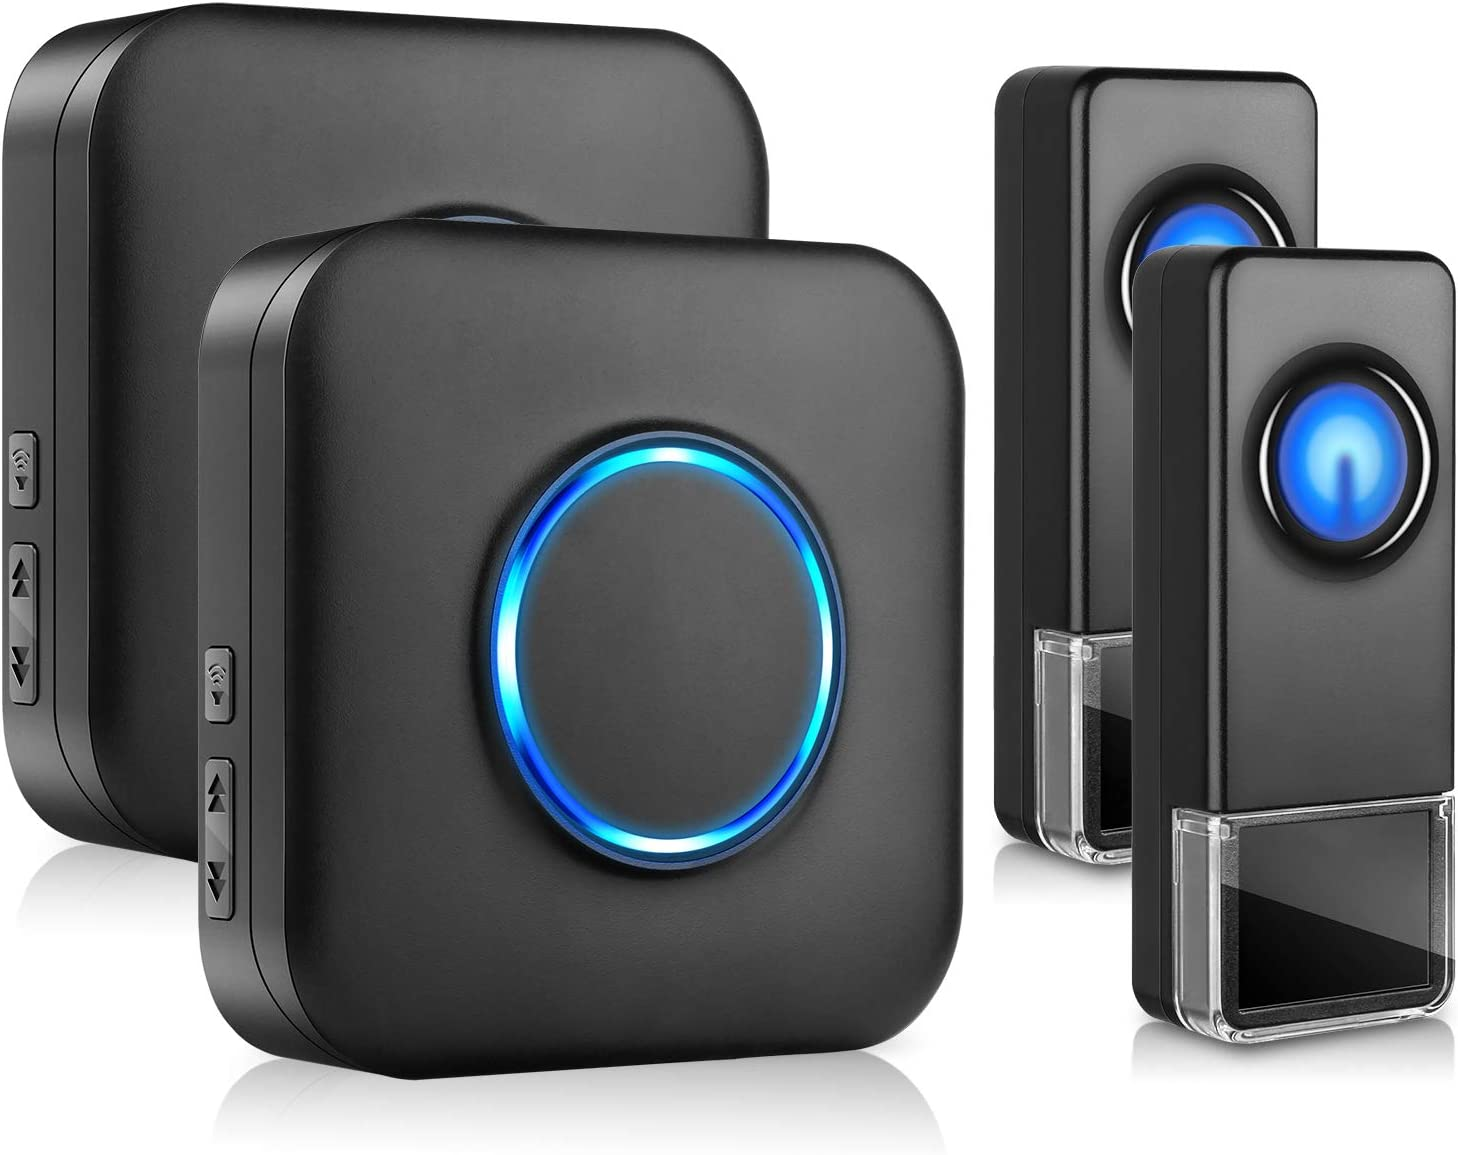 BITIWEND Wireless Doorbell, BITIWEND Waterproof Door Bells & Chimes Wireless Kit–1000-Foot Range, 58 Door Bell Chime, 5 Volume Levels with LED Flash for Home–2 Push Buttons & 2 Receivers (Black)